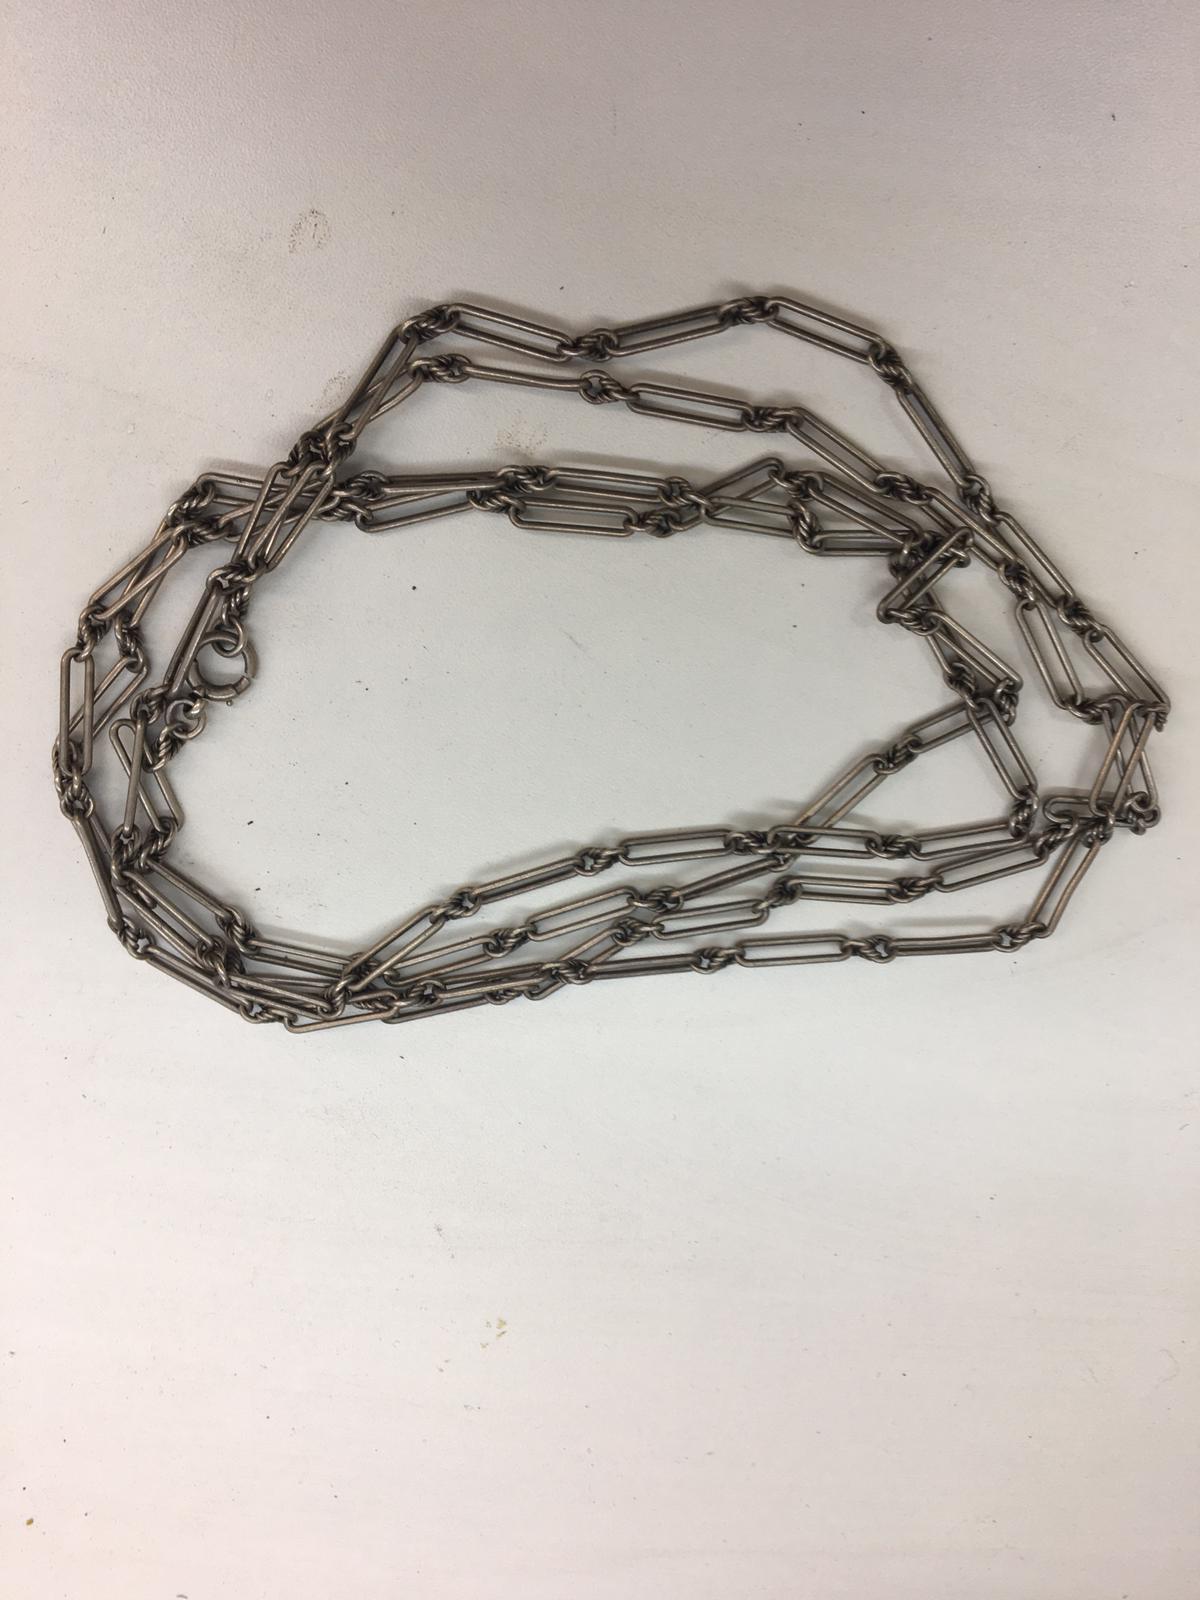 HM Silver longuard chain 67g.